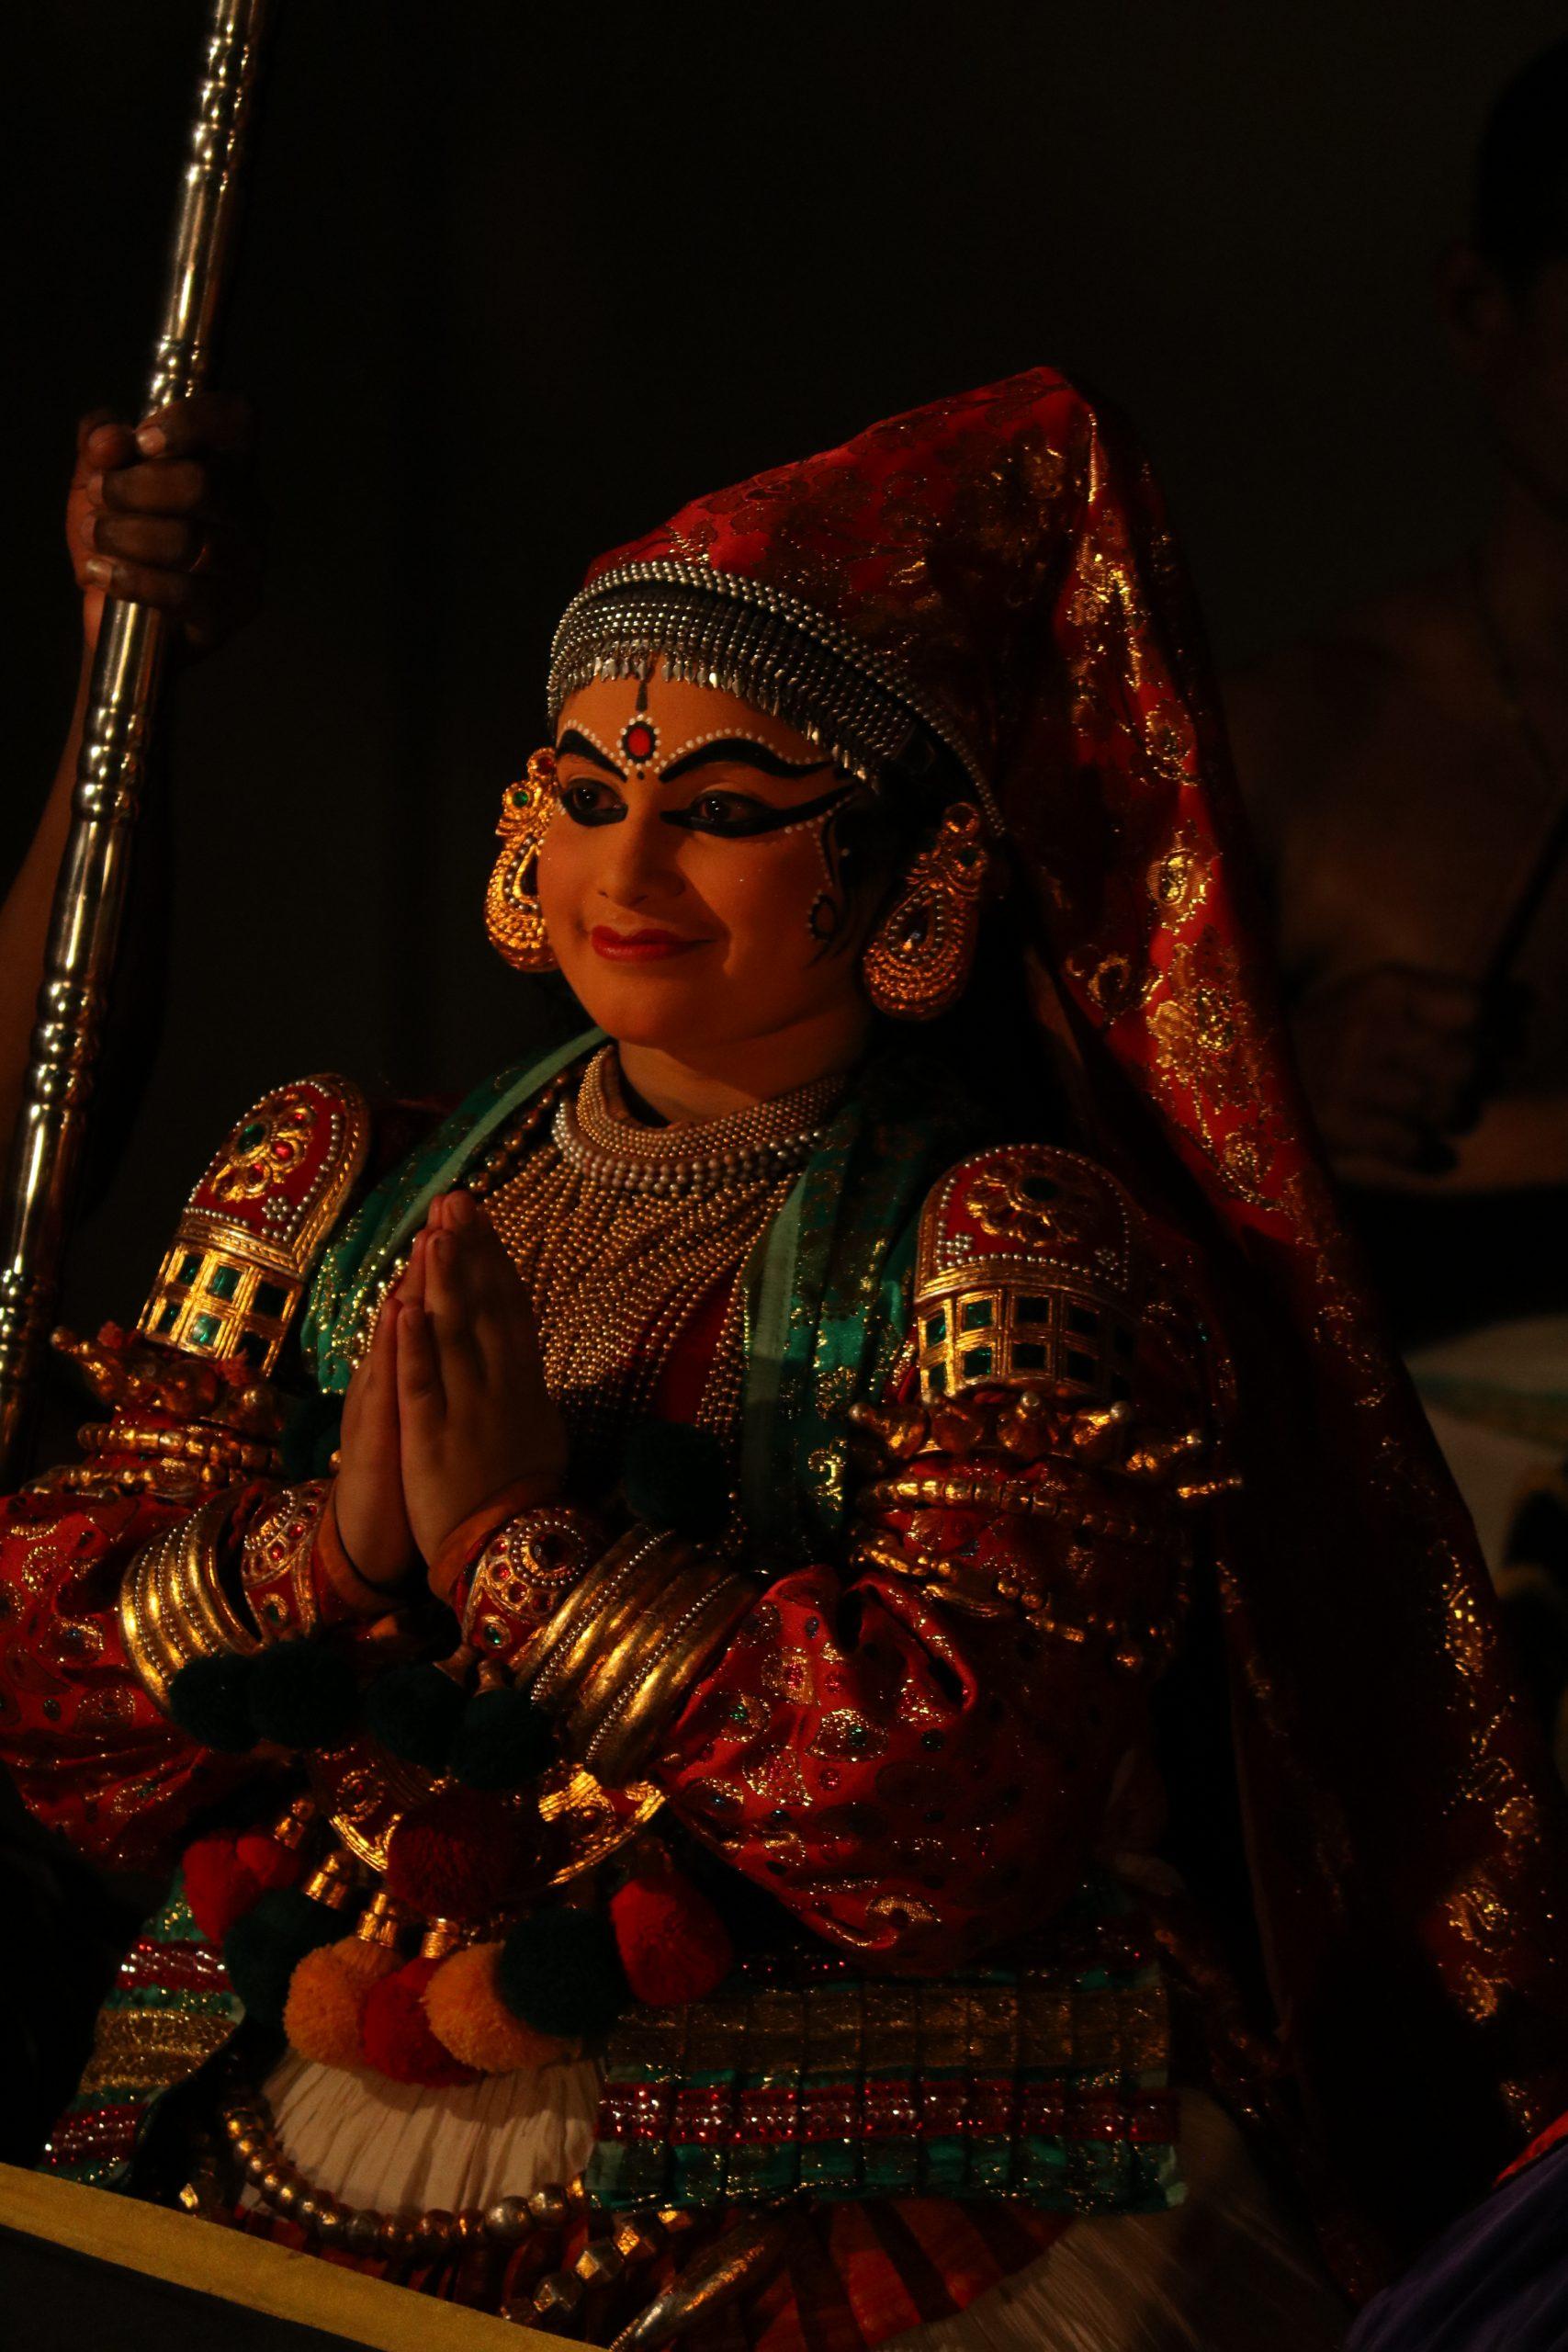 A female kathakali artist